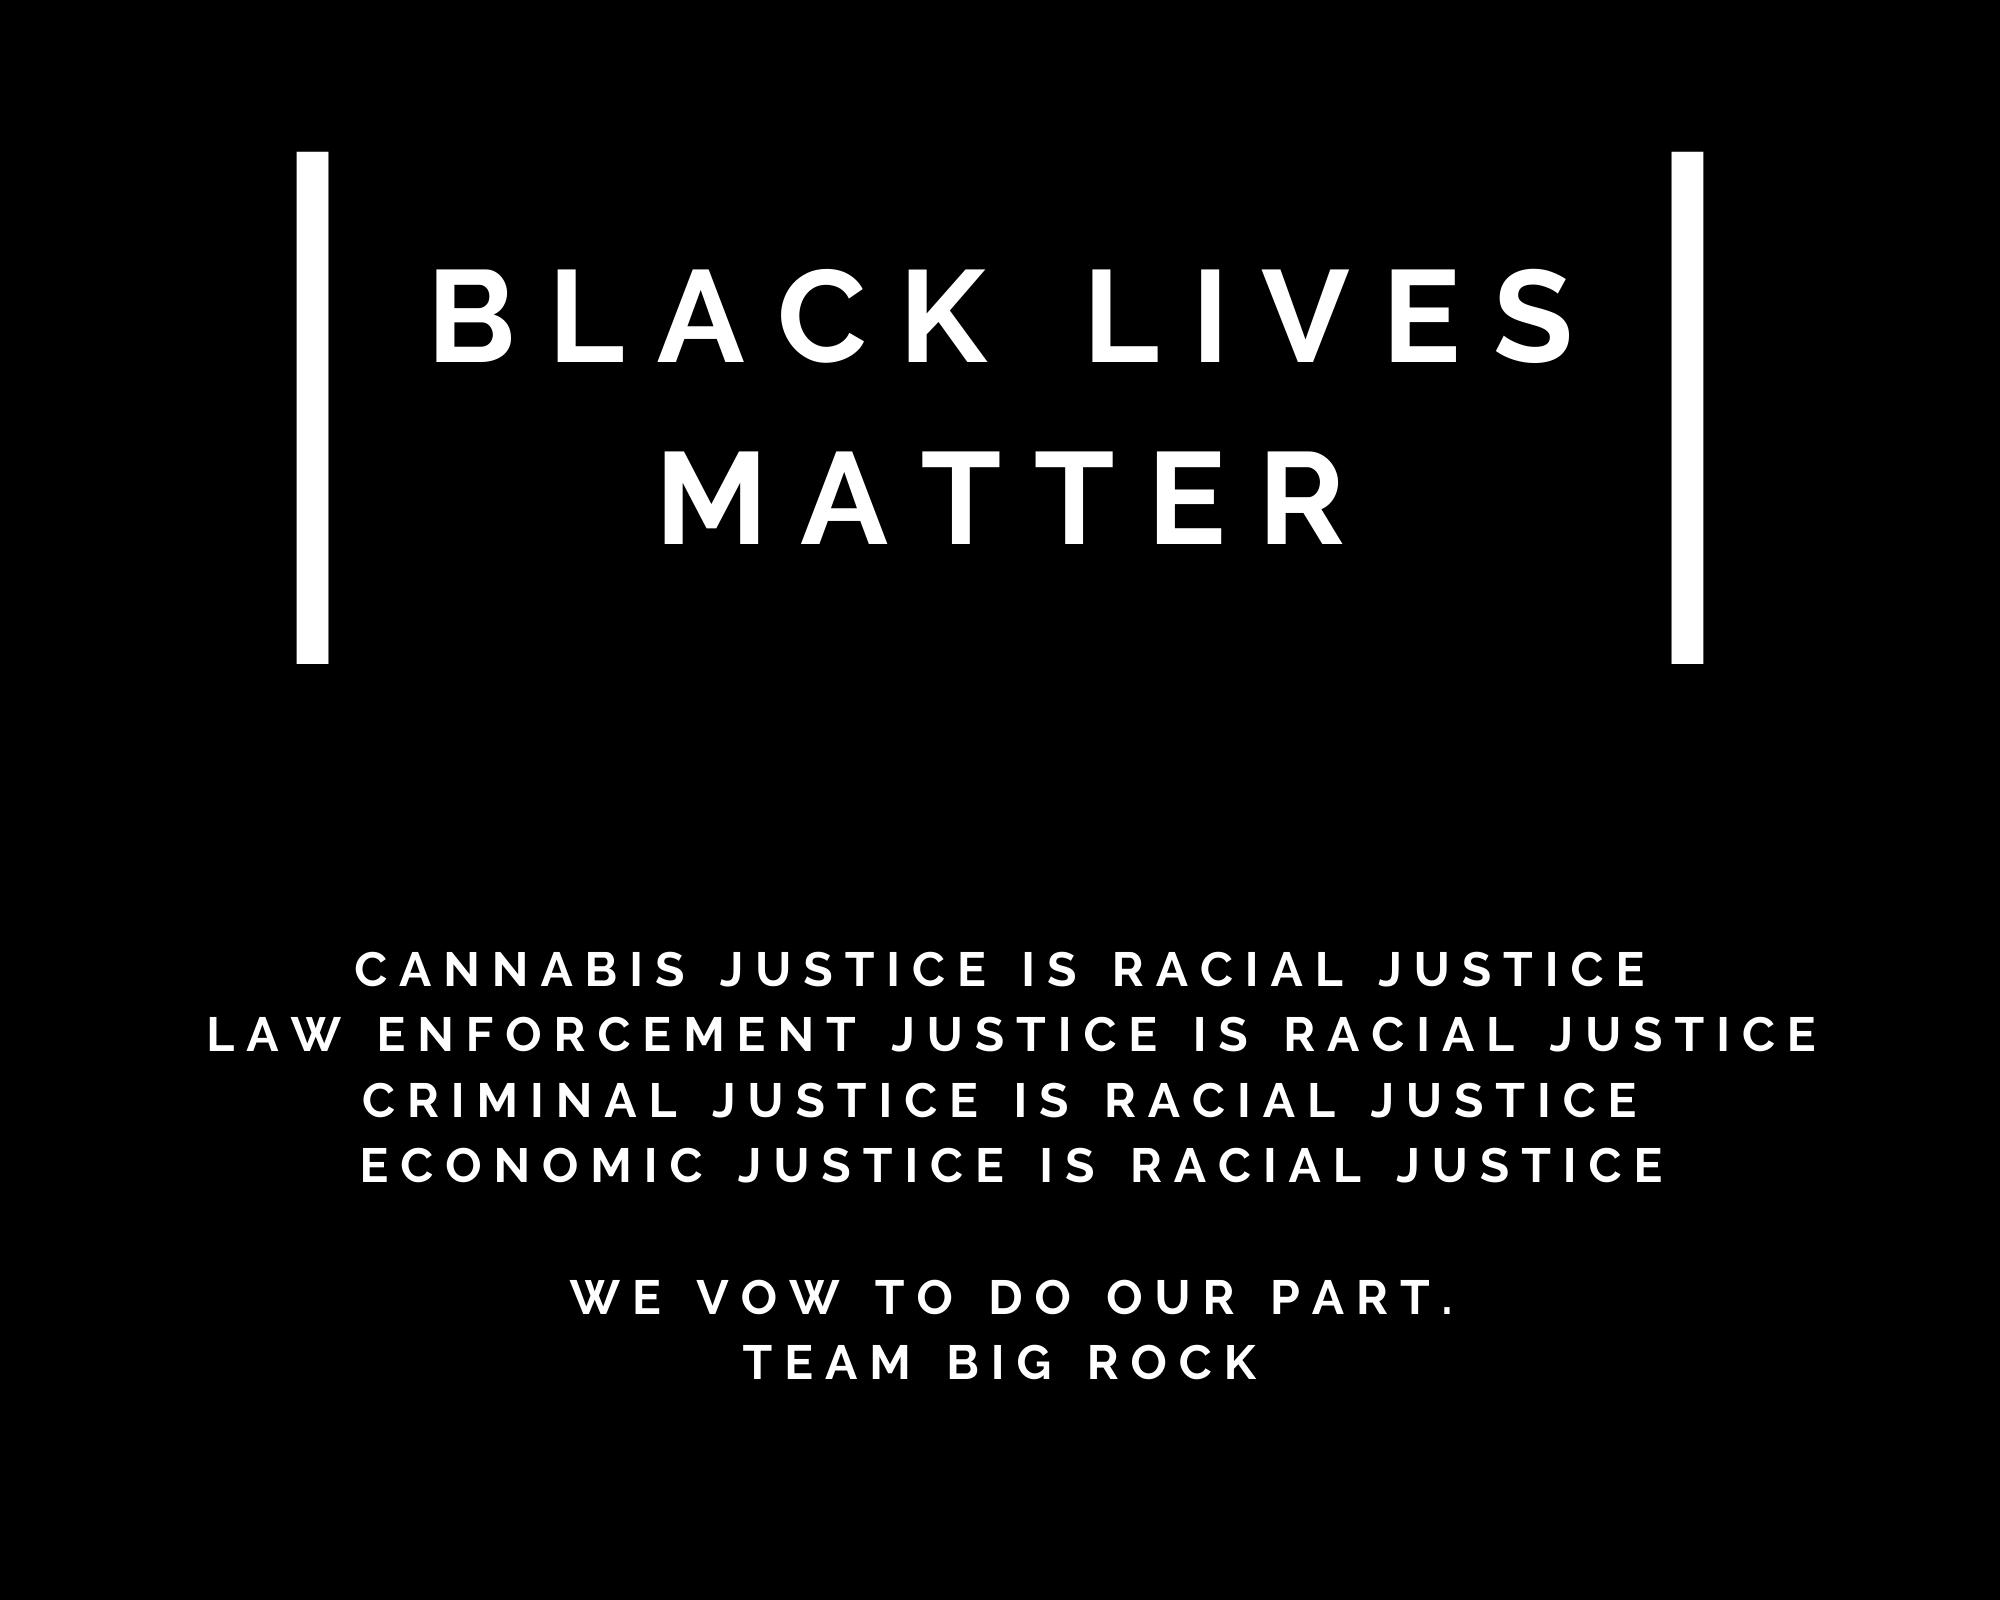 Cannabis Justice is Racial Justice